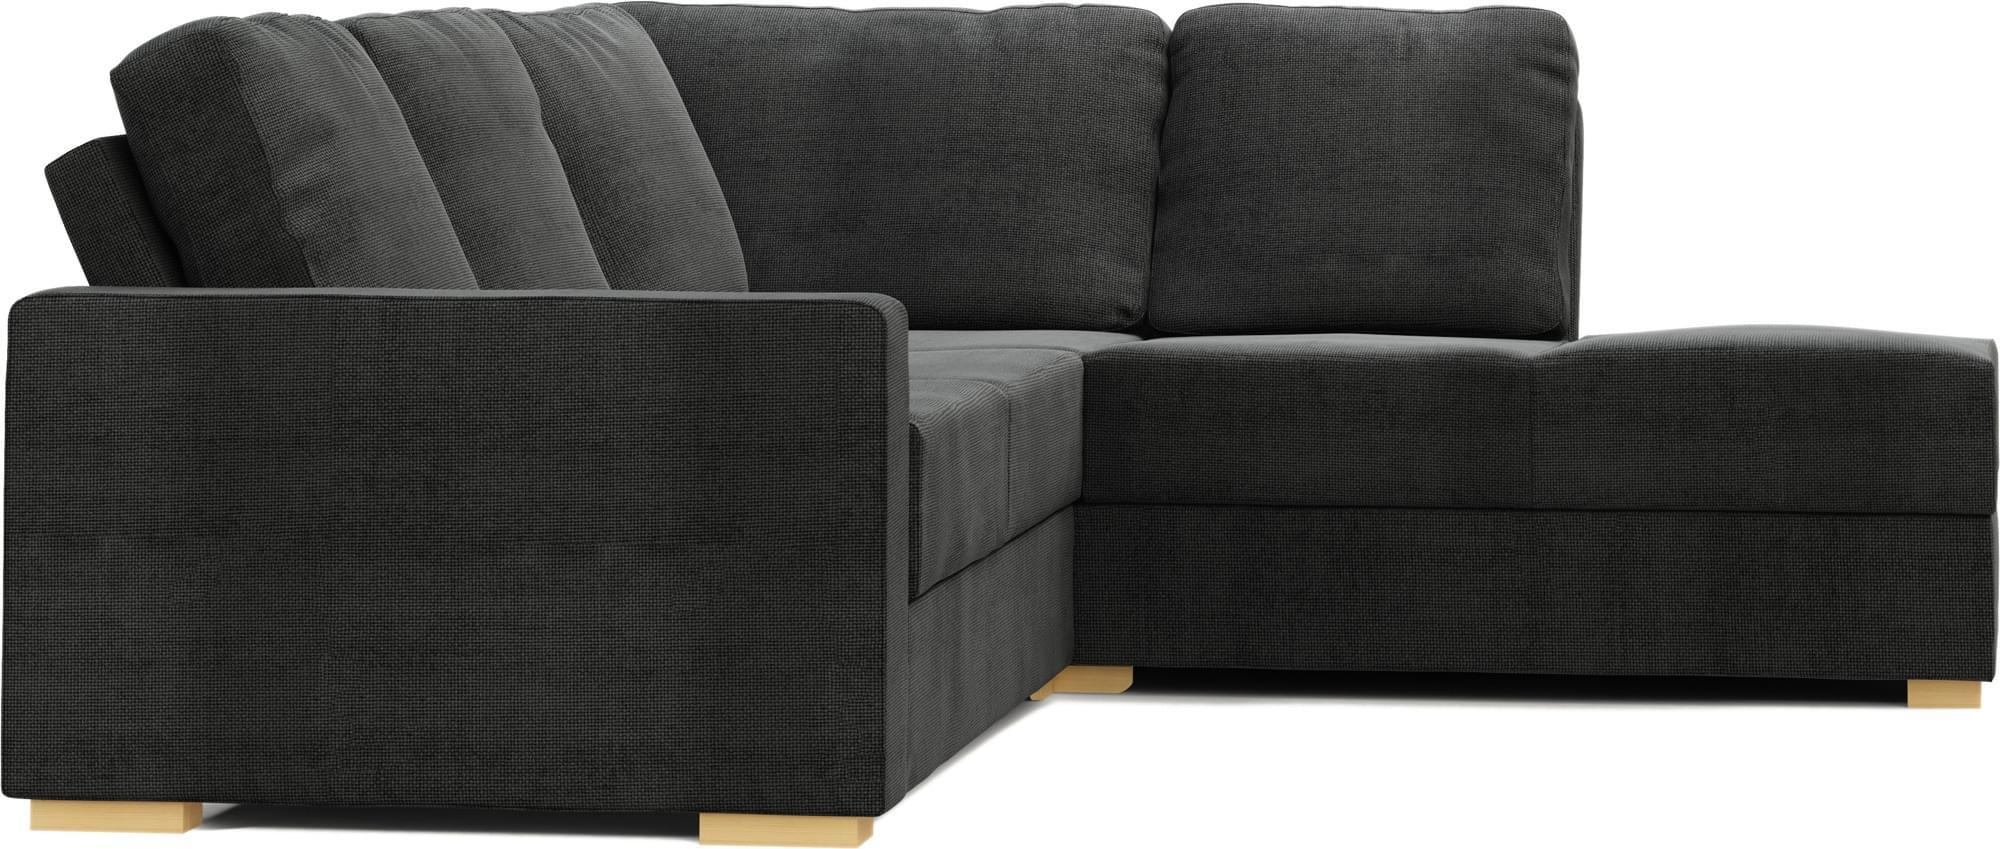 Lear chaise 3x3 corner corner chaise sofa nabru for Barcelona chaise corner sofa